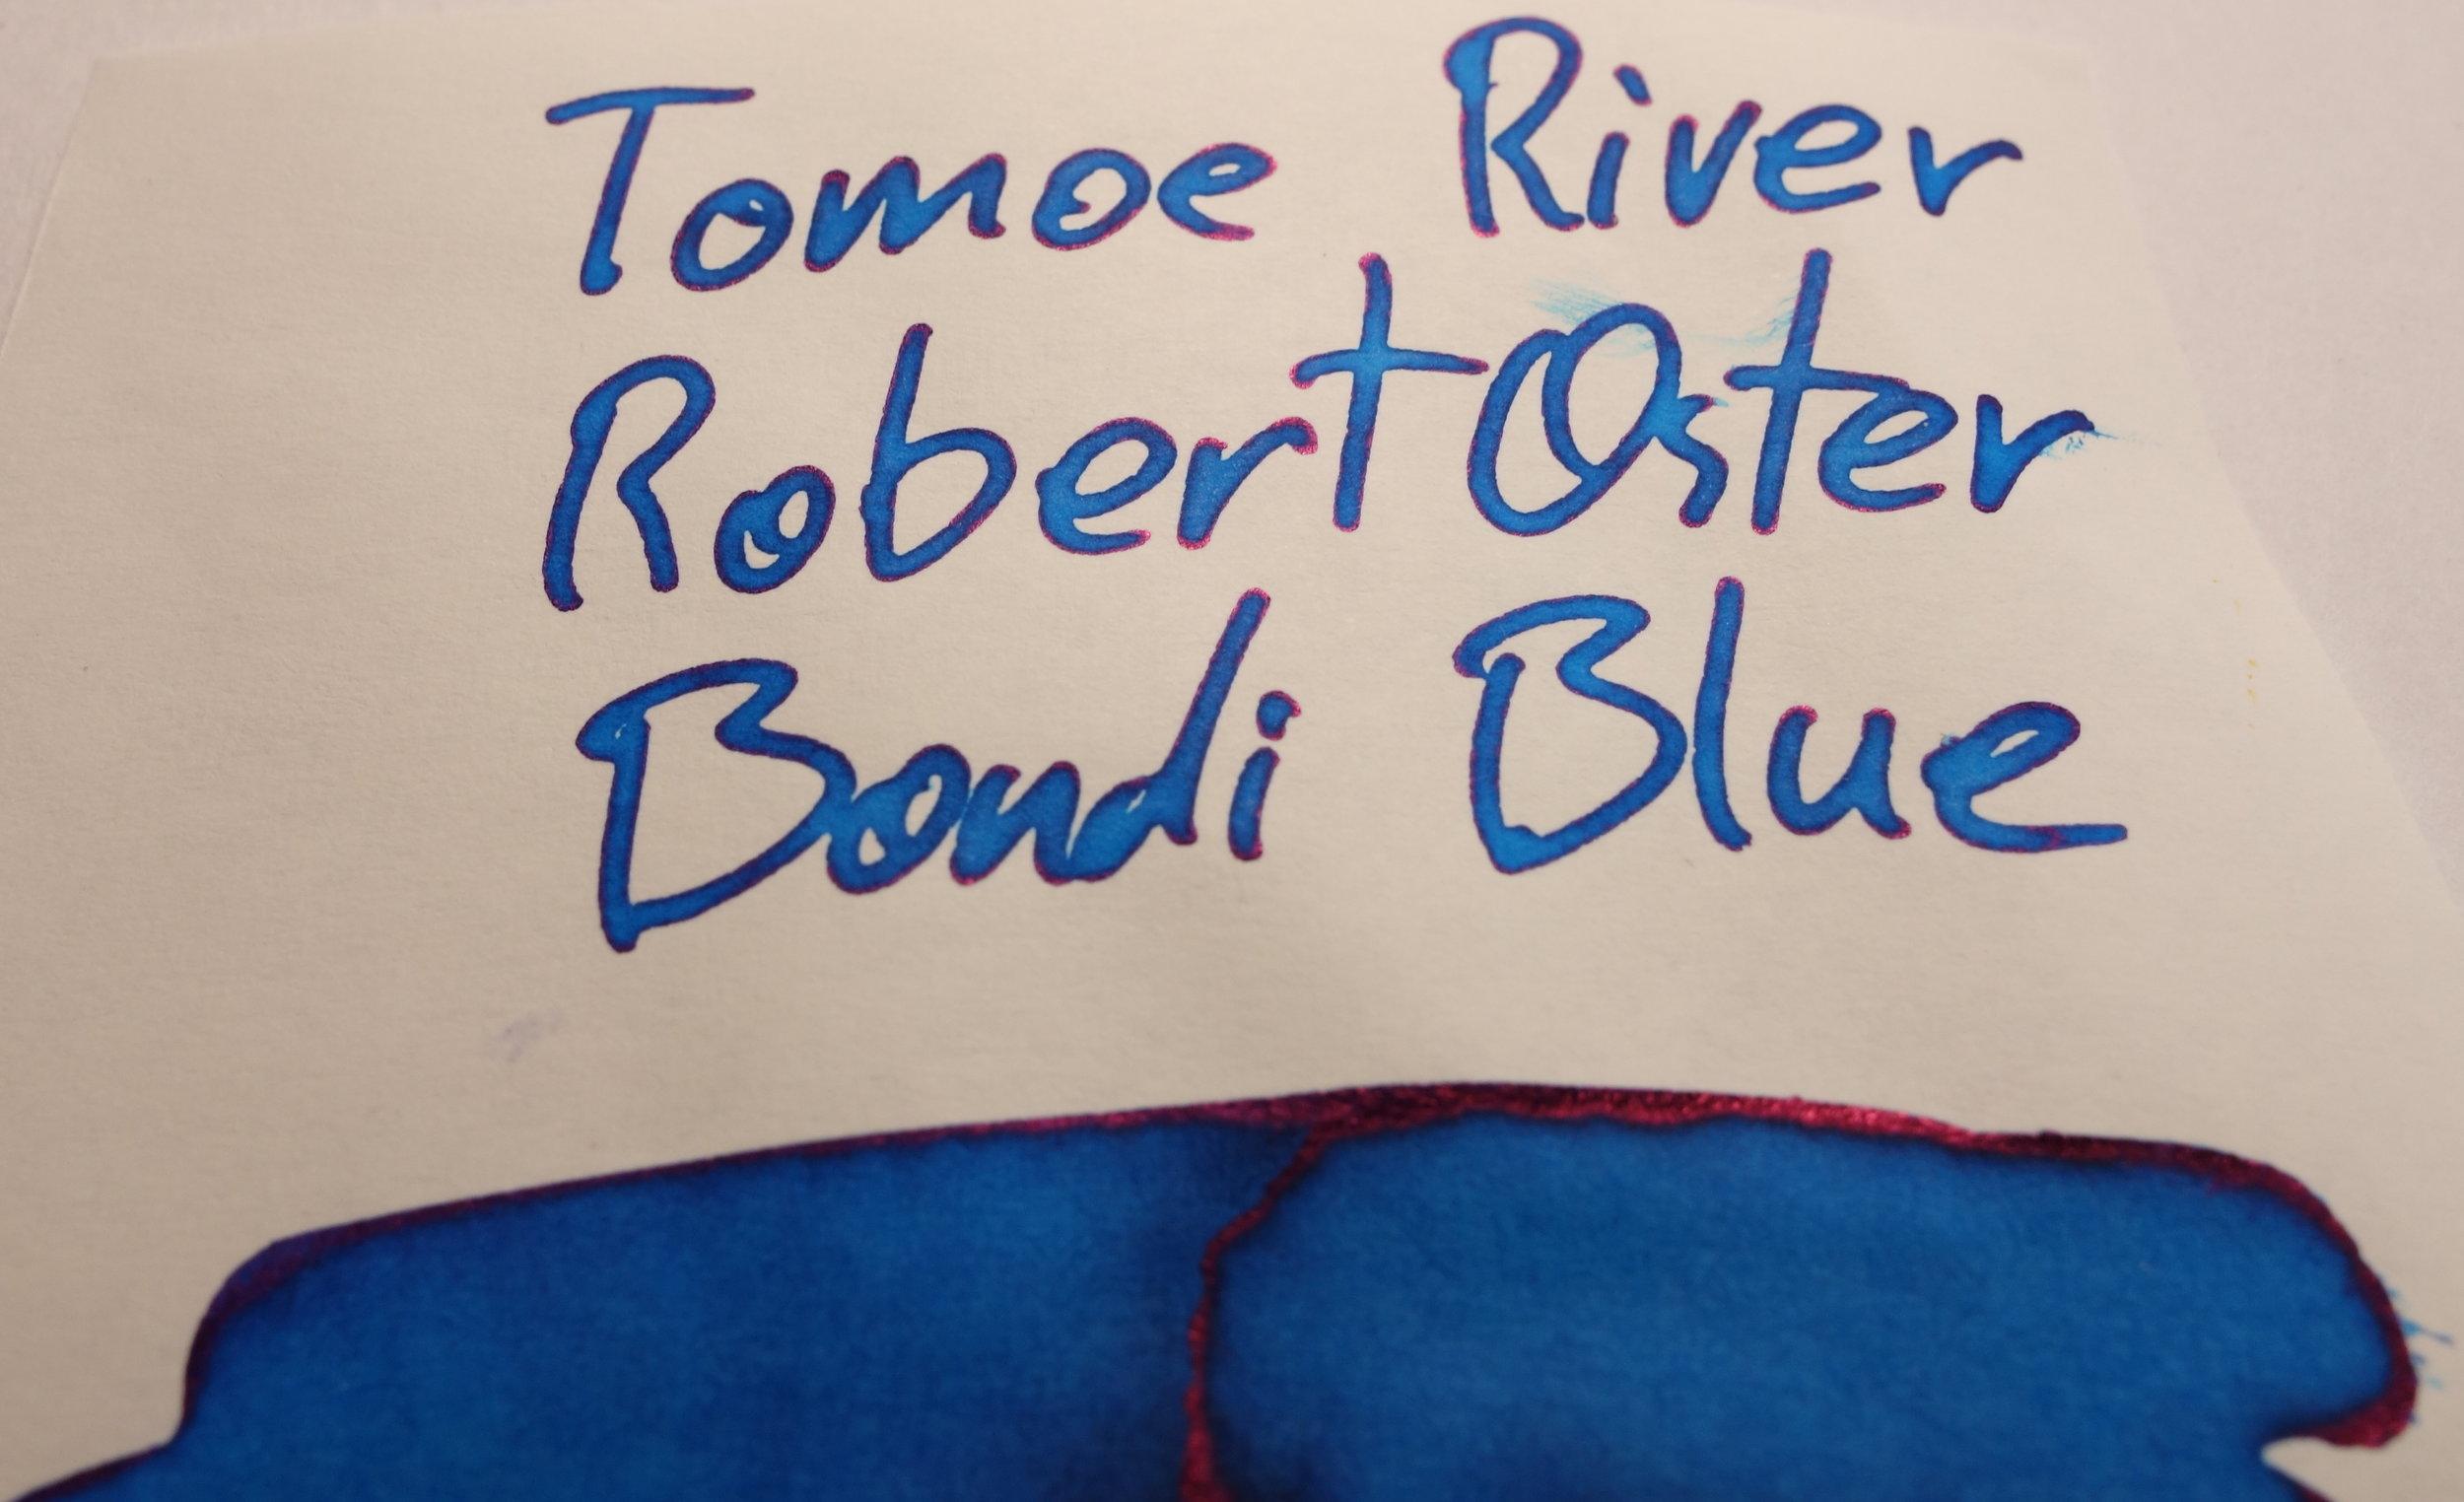 Robert Oster Bondi Blue Sheen Tomoe River.JPG